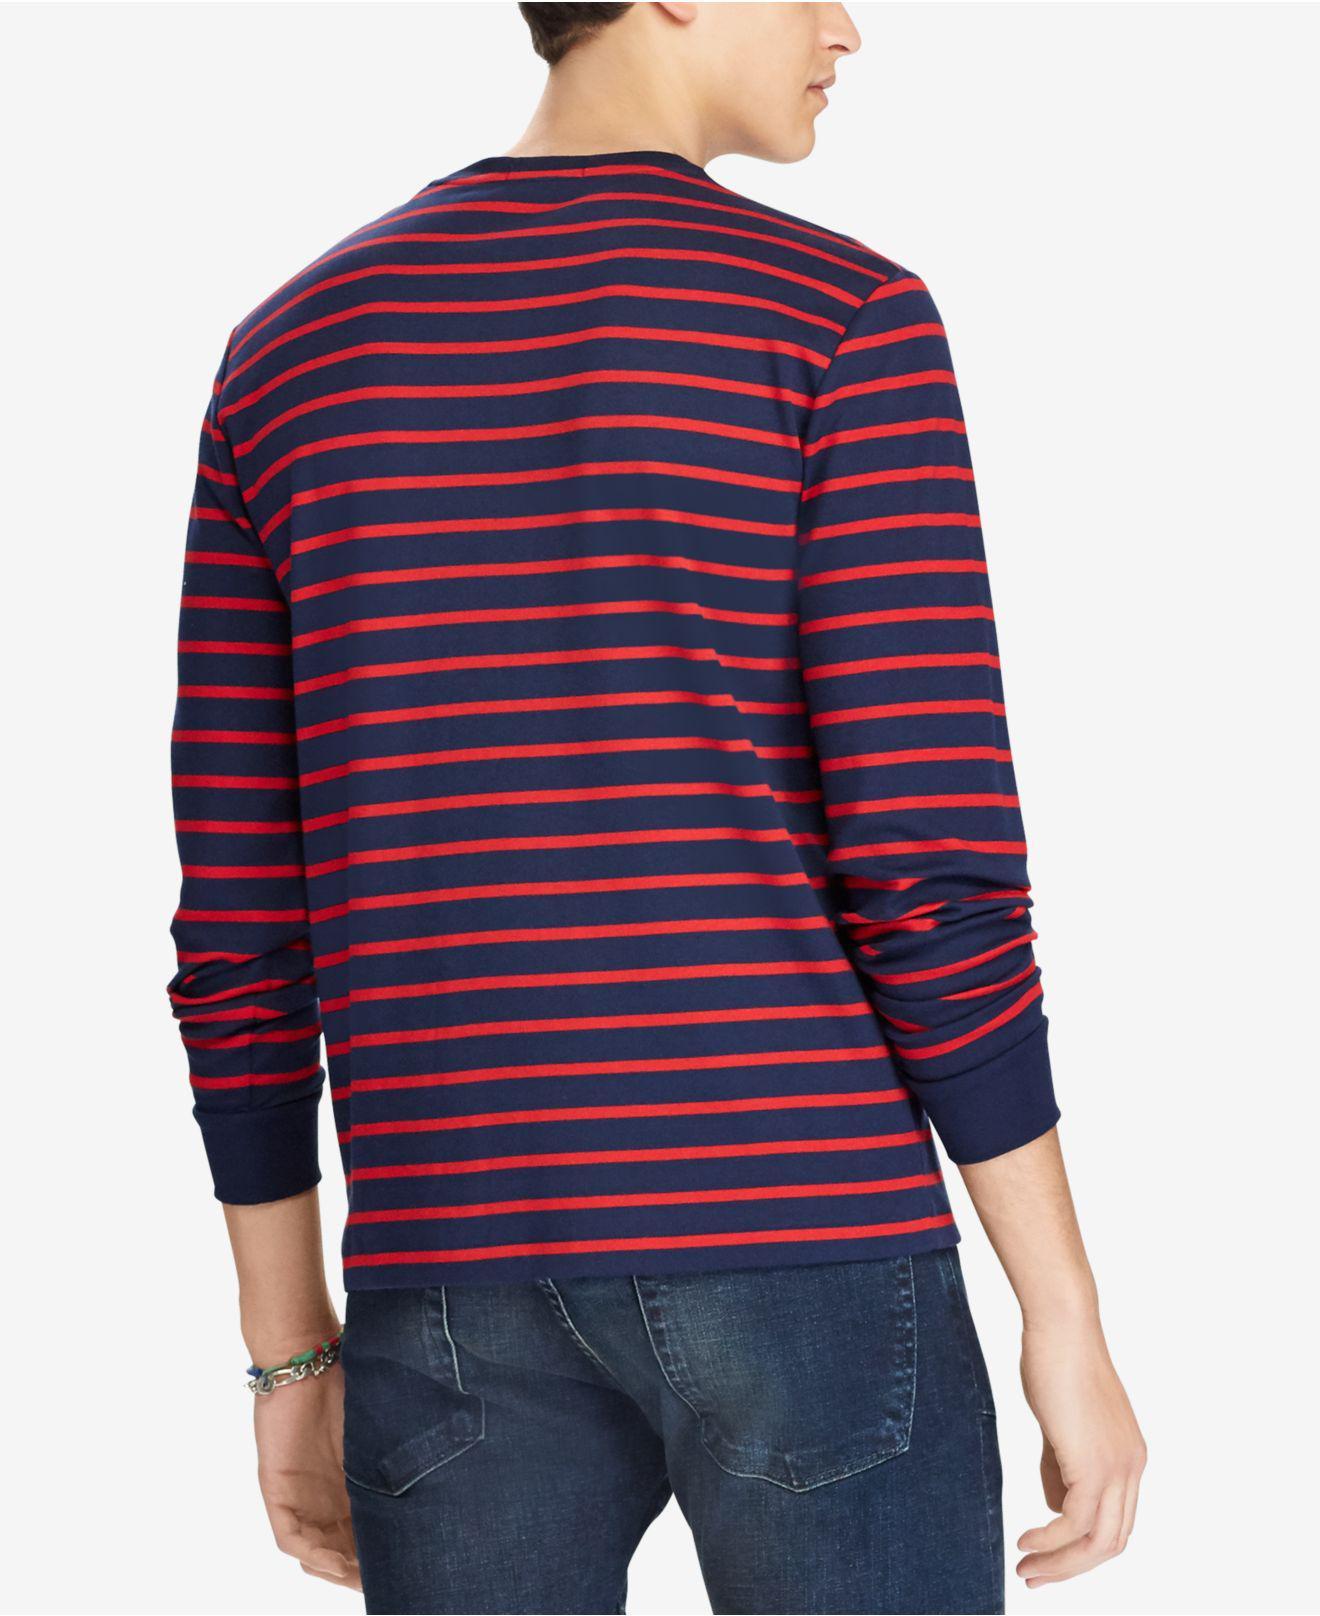 5d0736103 ... sale lyst polo ralph lauren custom slim fit striped long sleeve t shirt  for men save